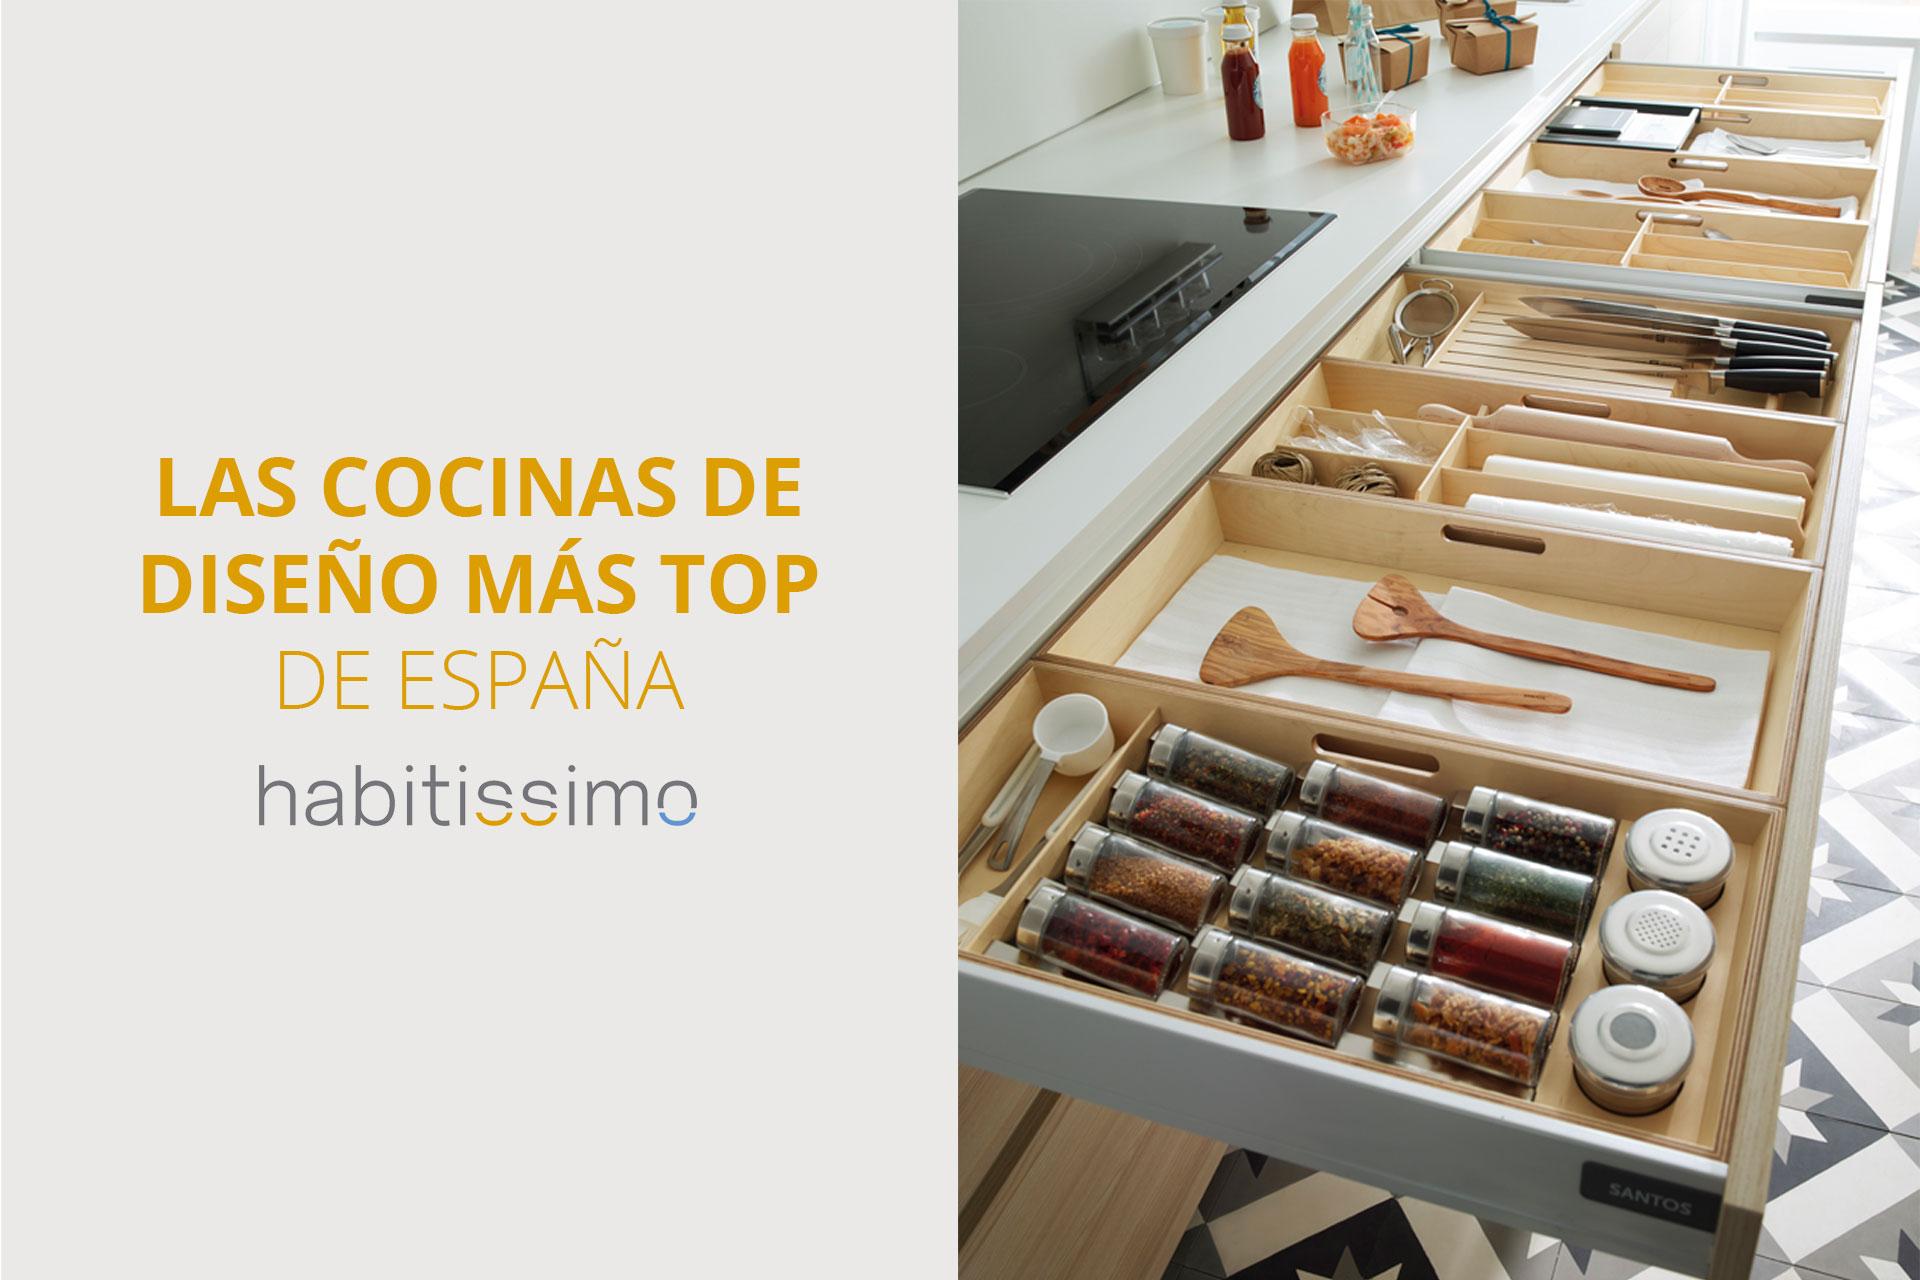 Cocinas Top de España: ranking de Habitissimo | Cocinas Santos | Santiago Interiores